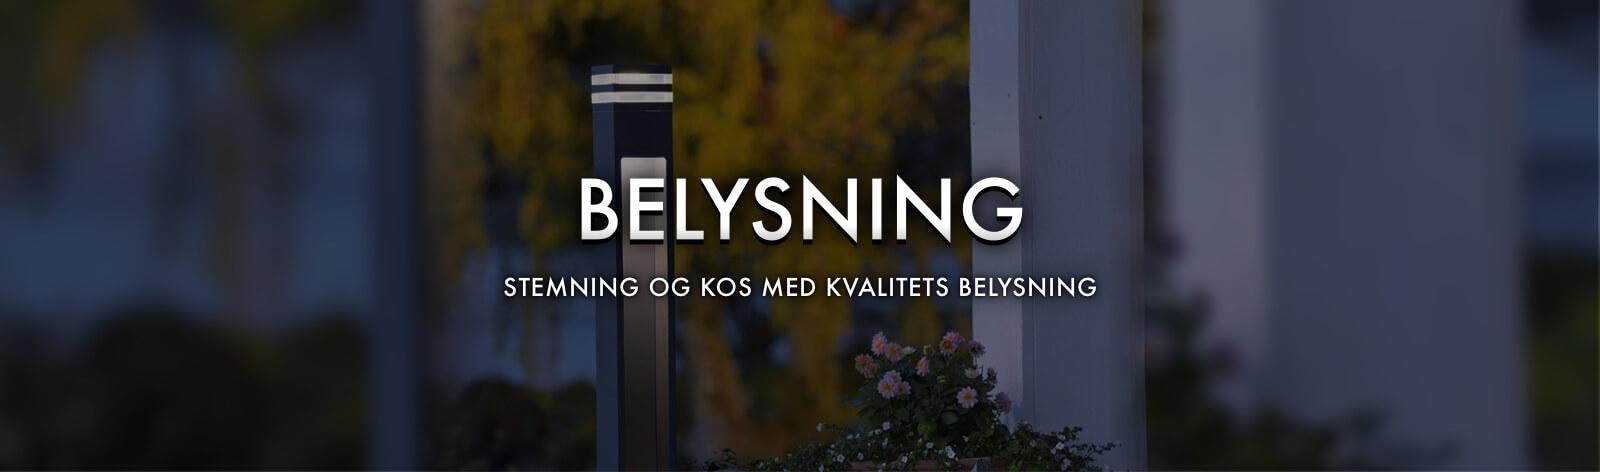 Belysning